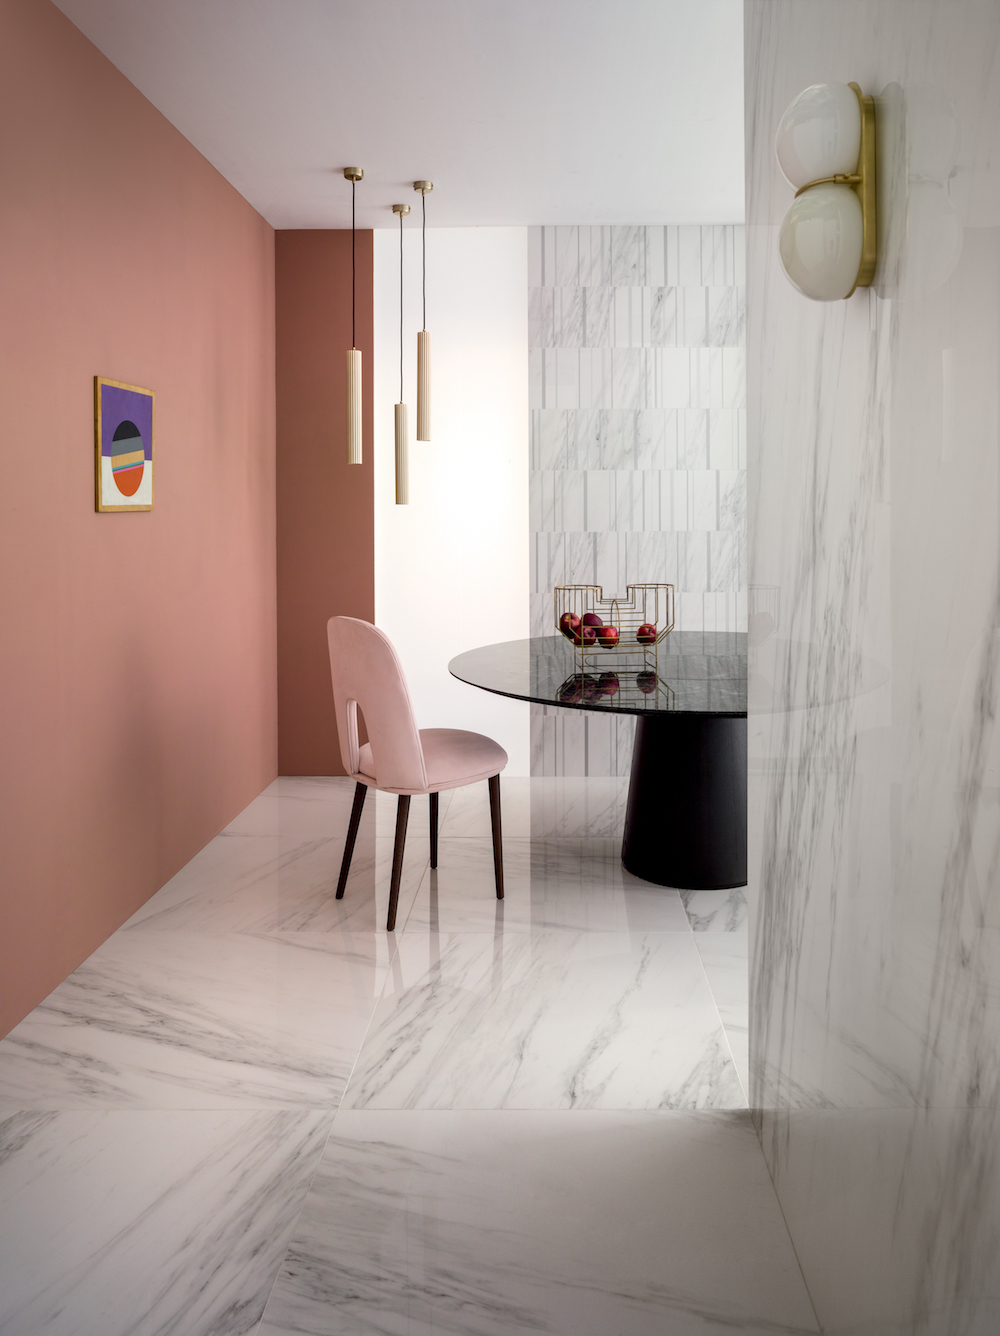 A clean, pastel interior scheme on surfaces